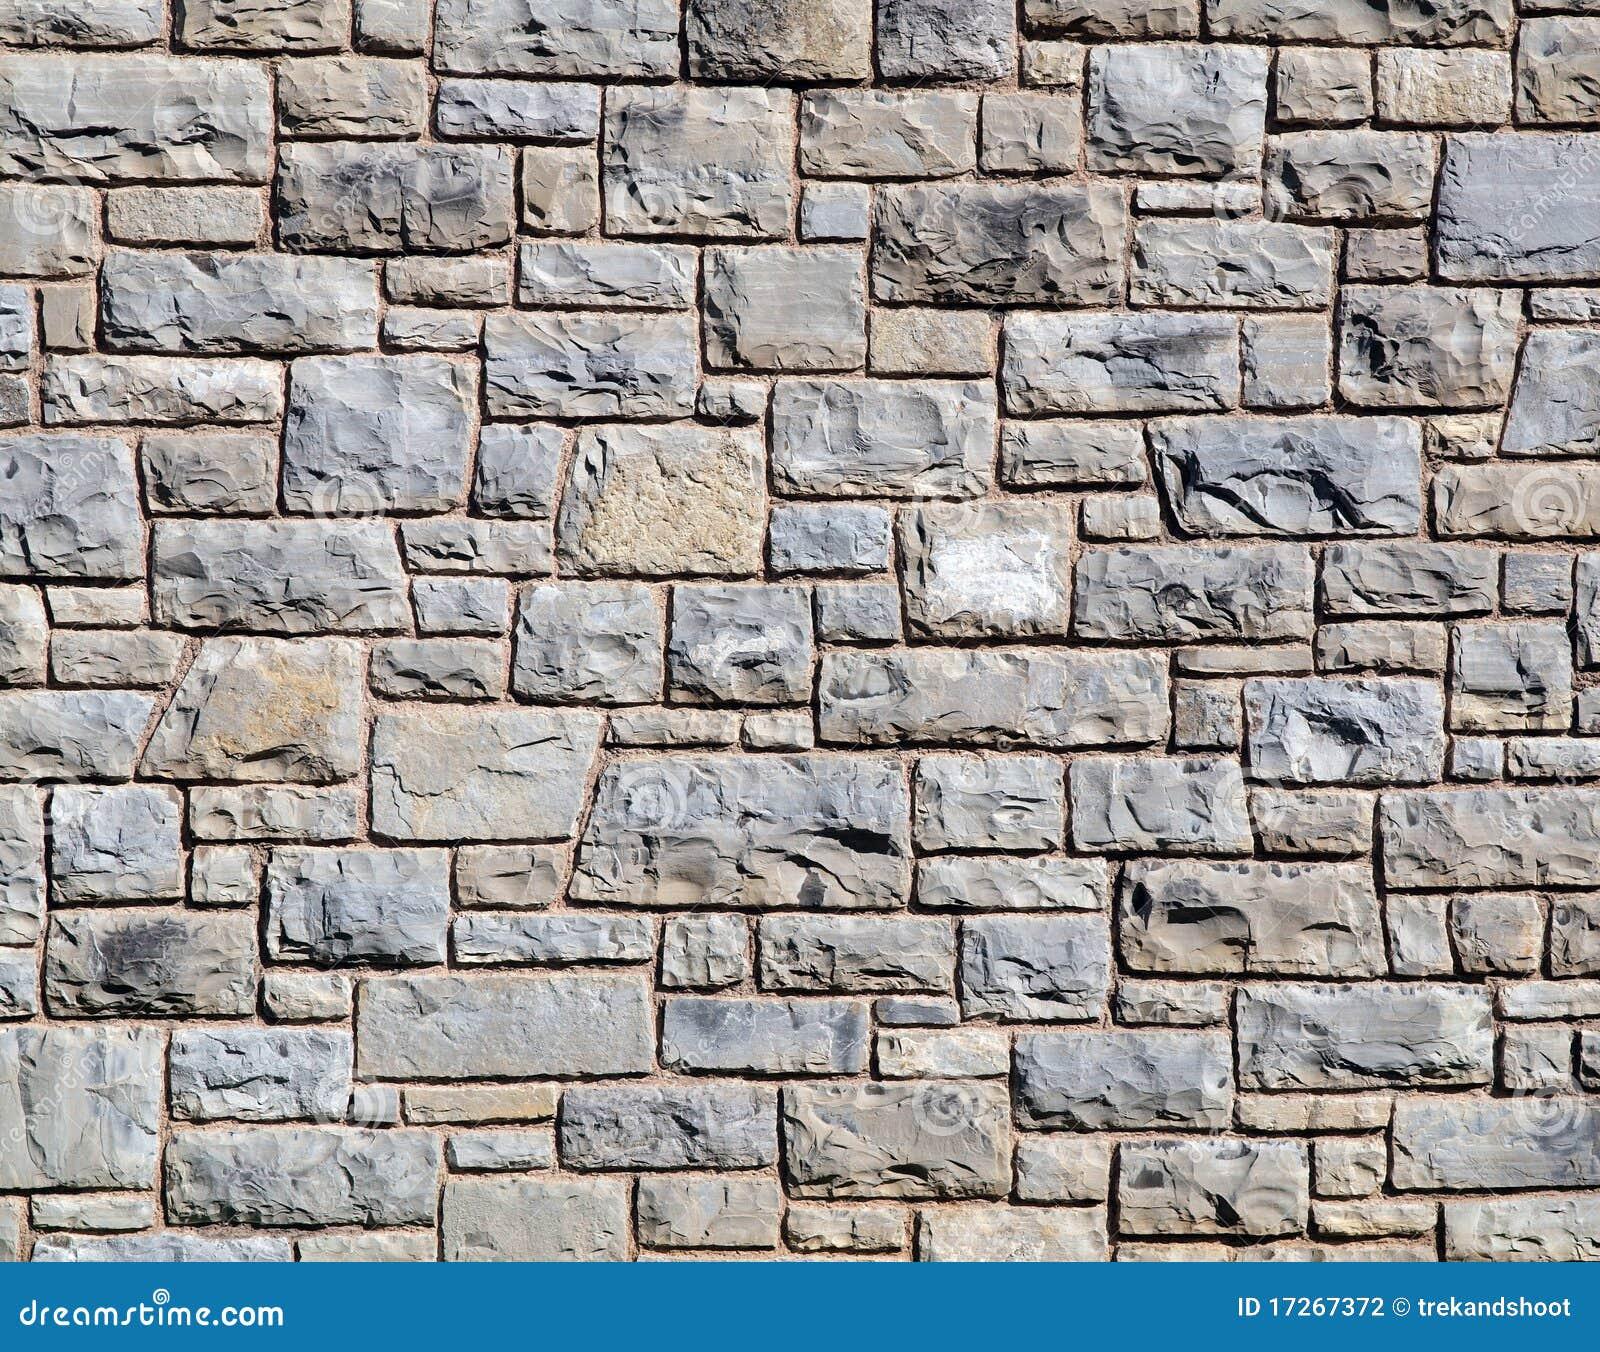 Stone Wall Background Stock Photography - Image: 17267372